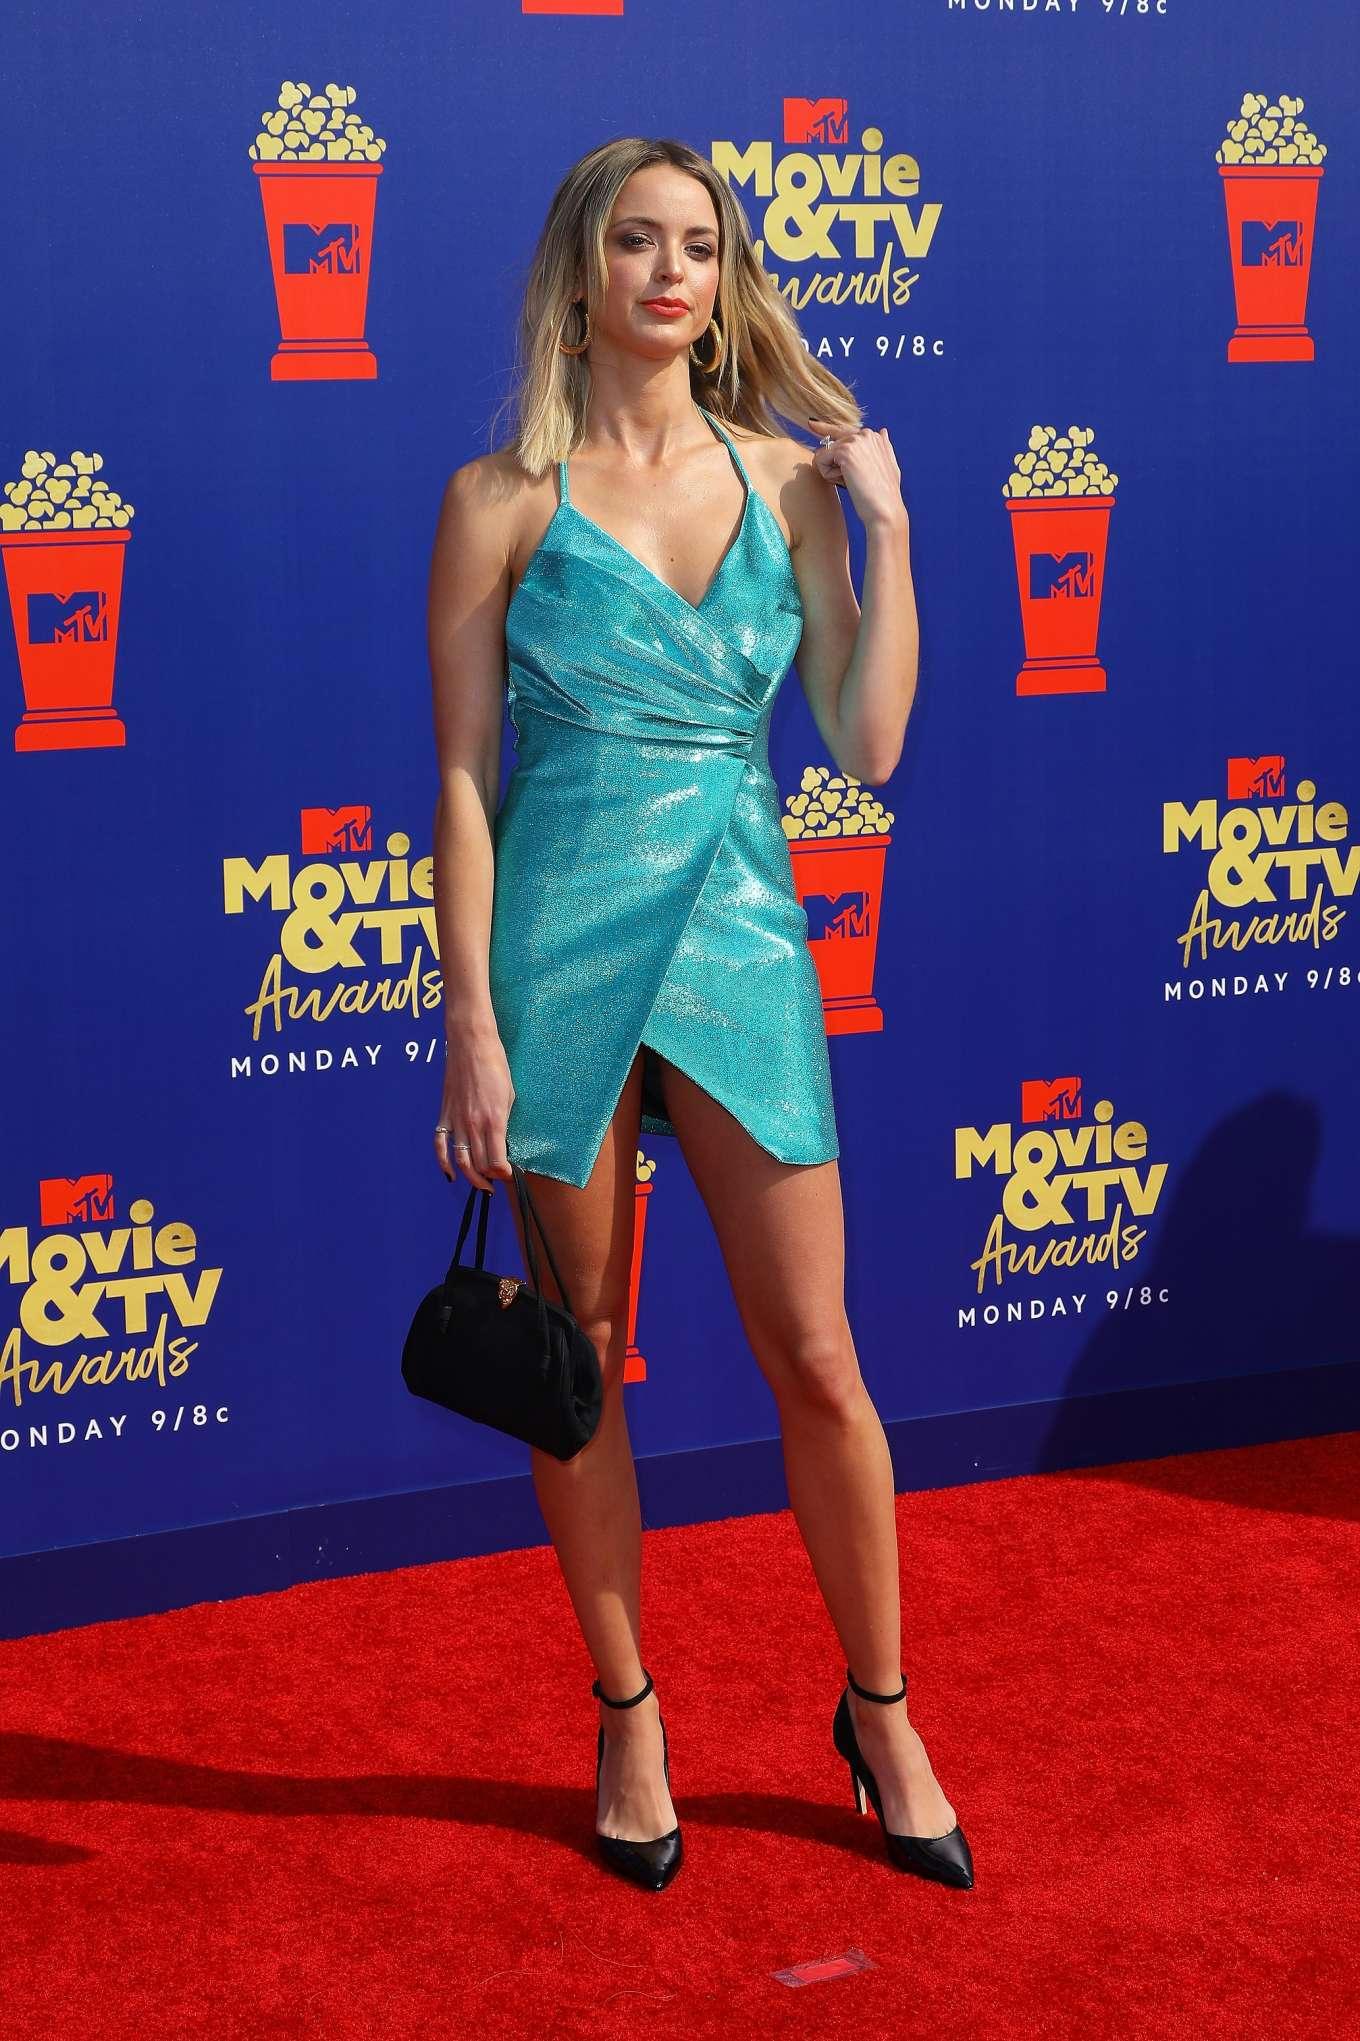 Kaitlynn Carter - 2019 MTV Movie and TV Awards Red Carpet in Santa Monica